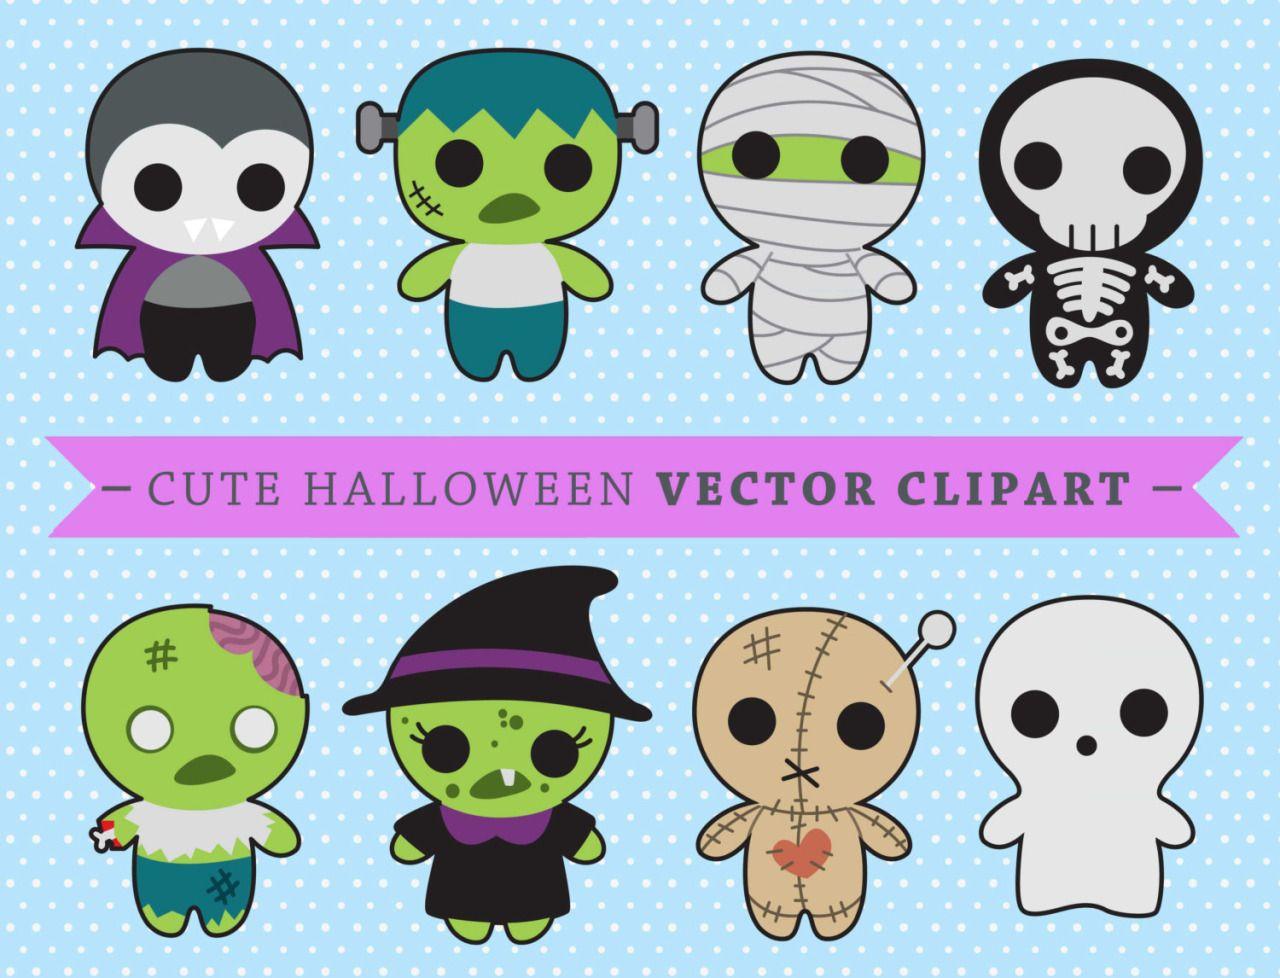 Premium Vector Clipart Kawaii Spooky Halloween